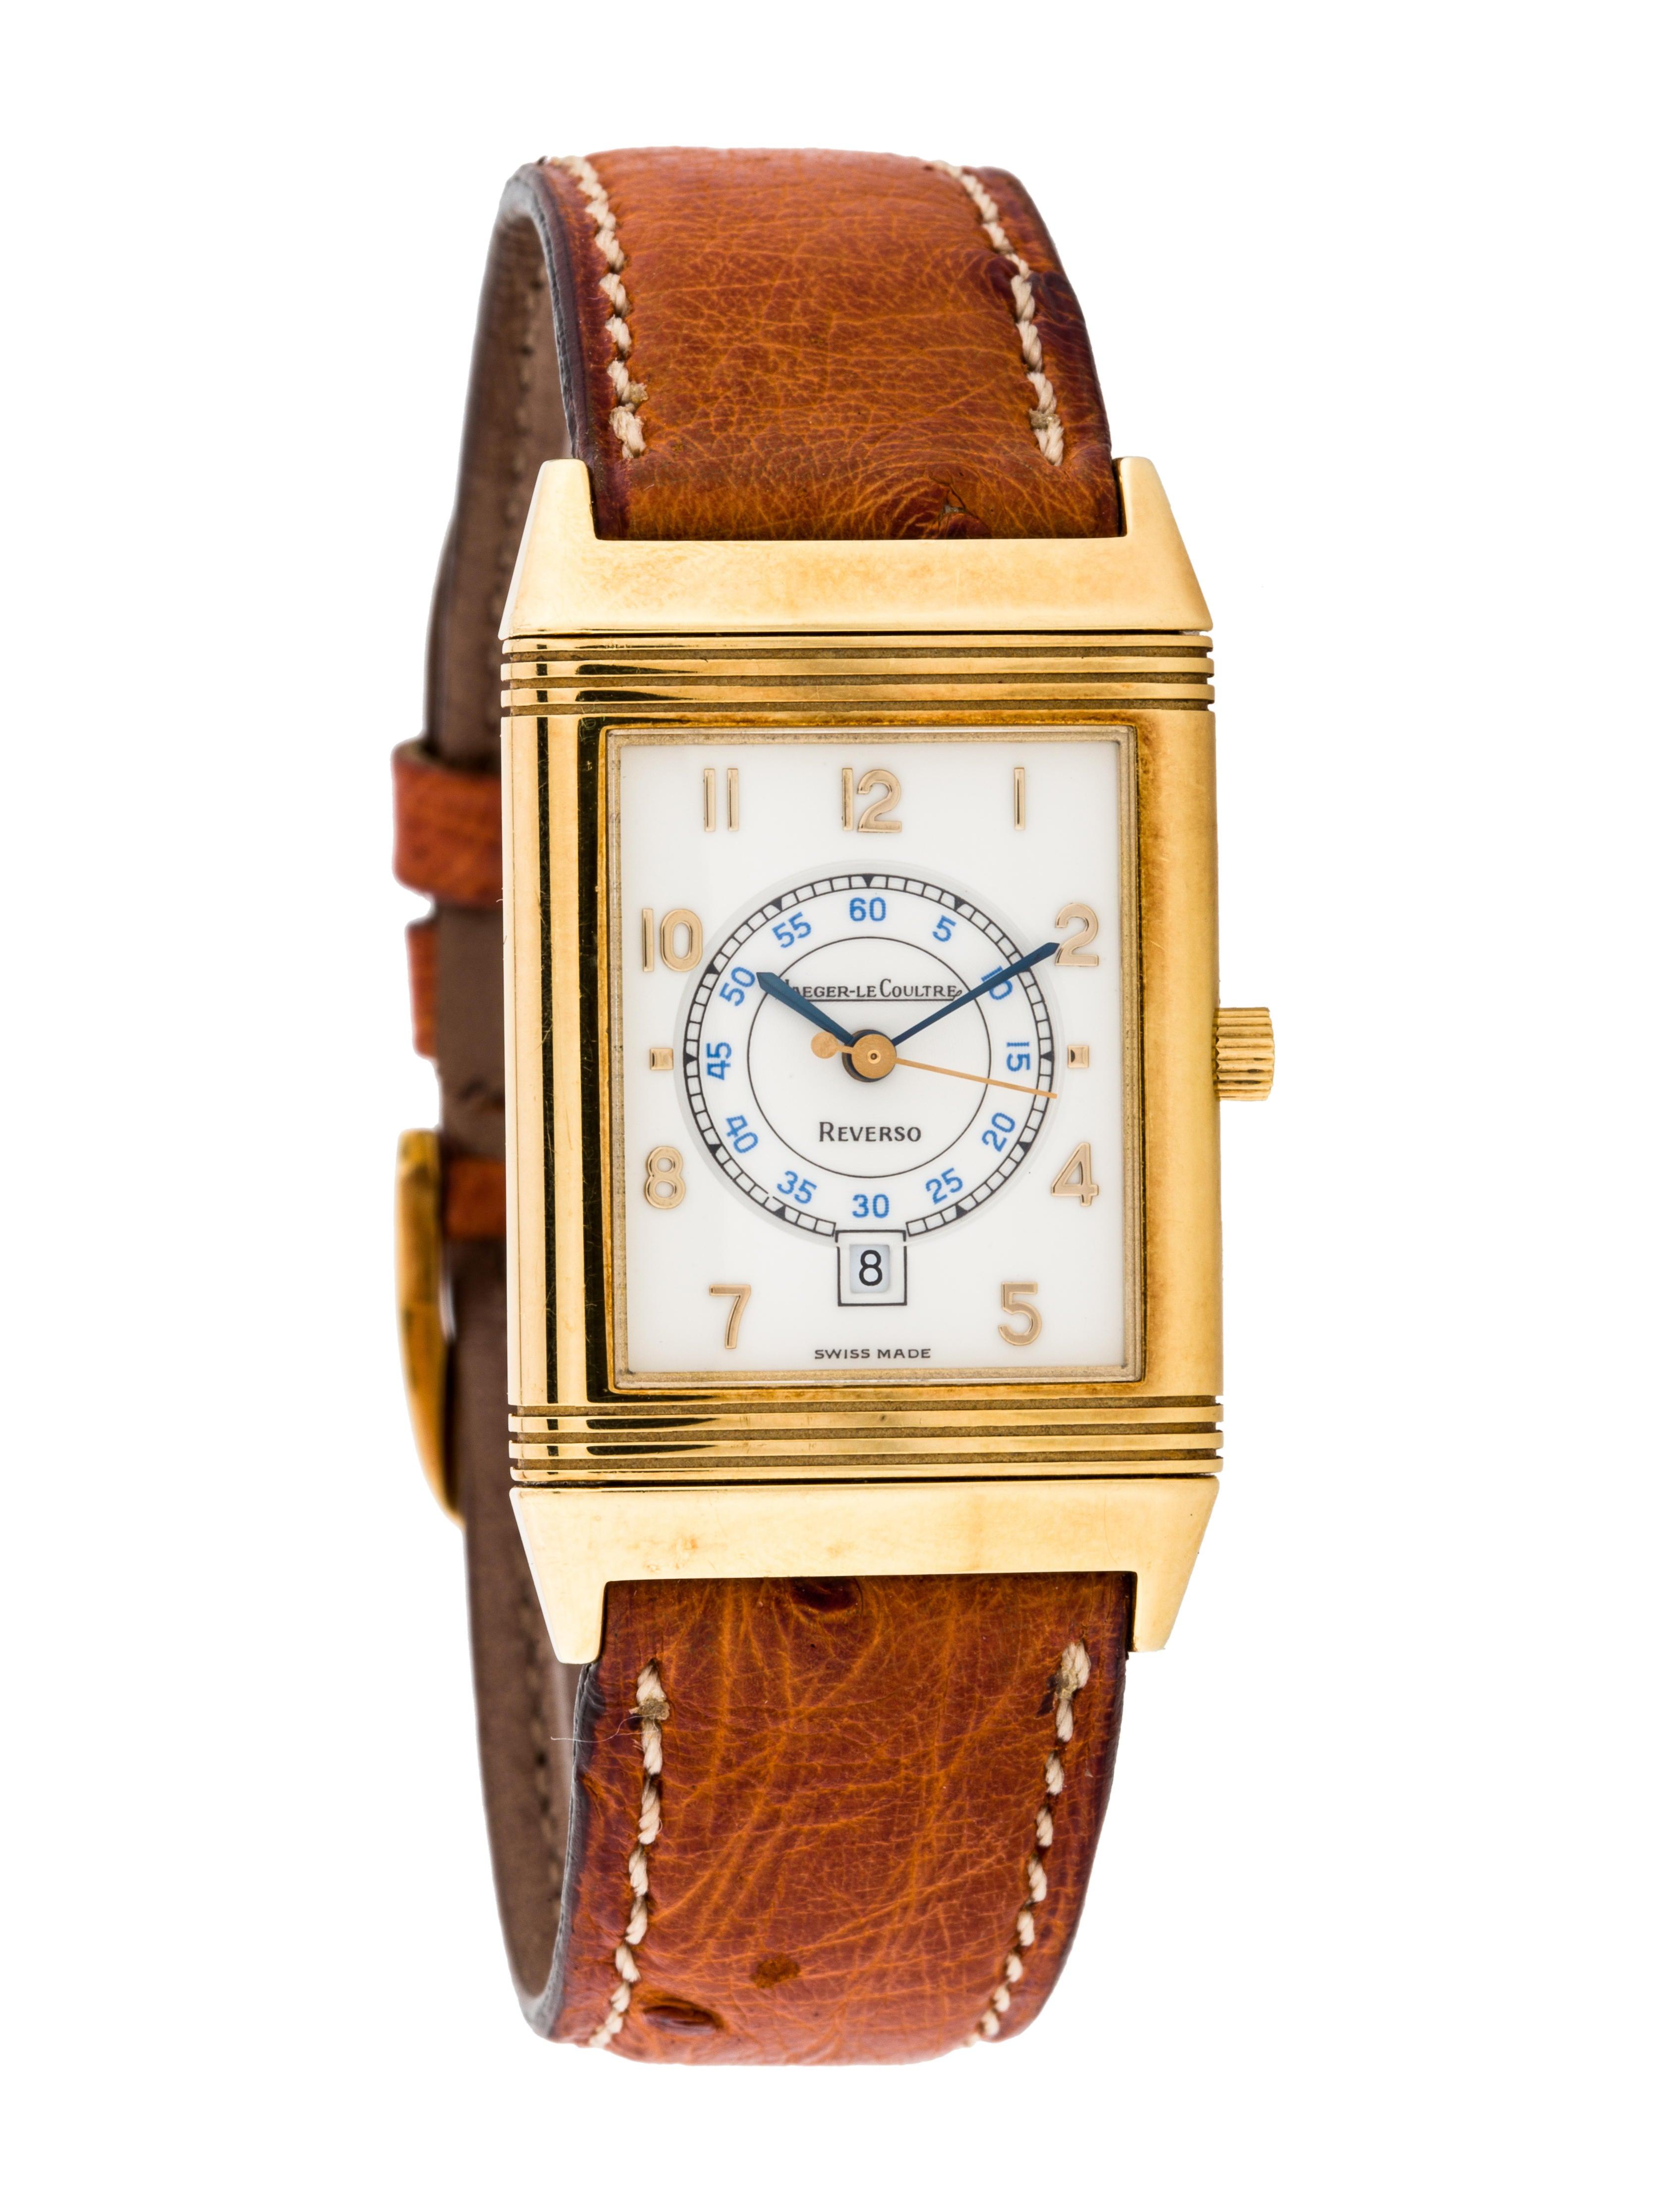 f3b867cc6809 Jaeger-LeCoultre Reverso Watch - Strap - JAE20432